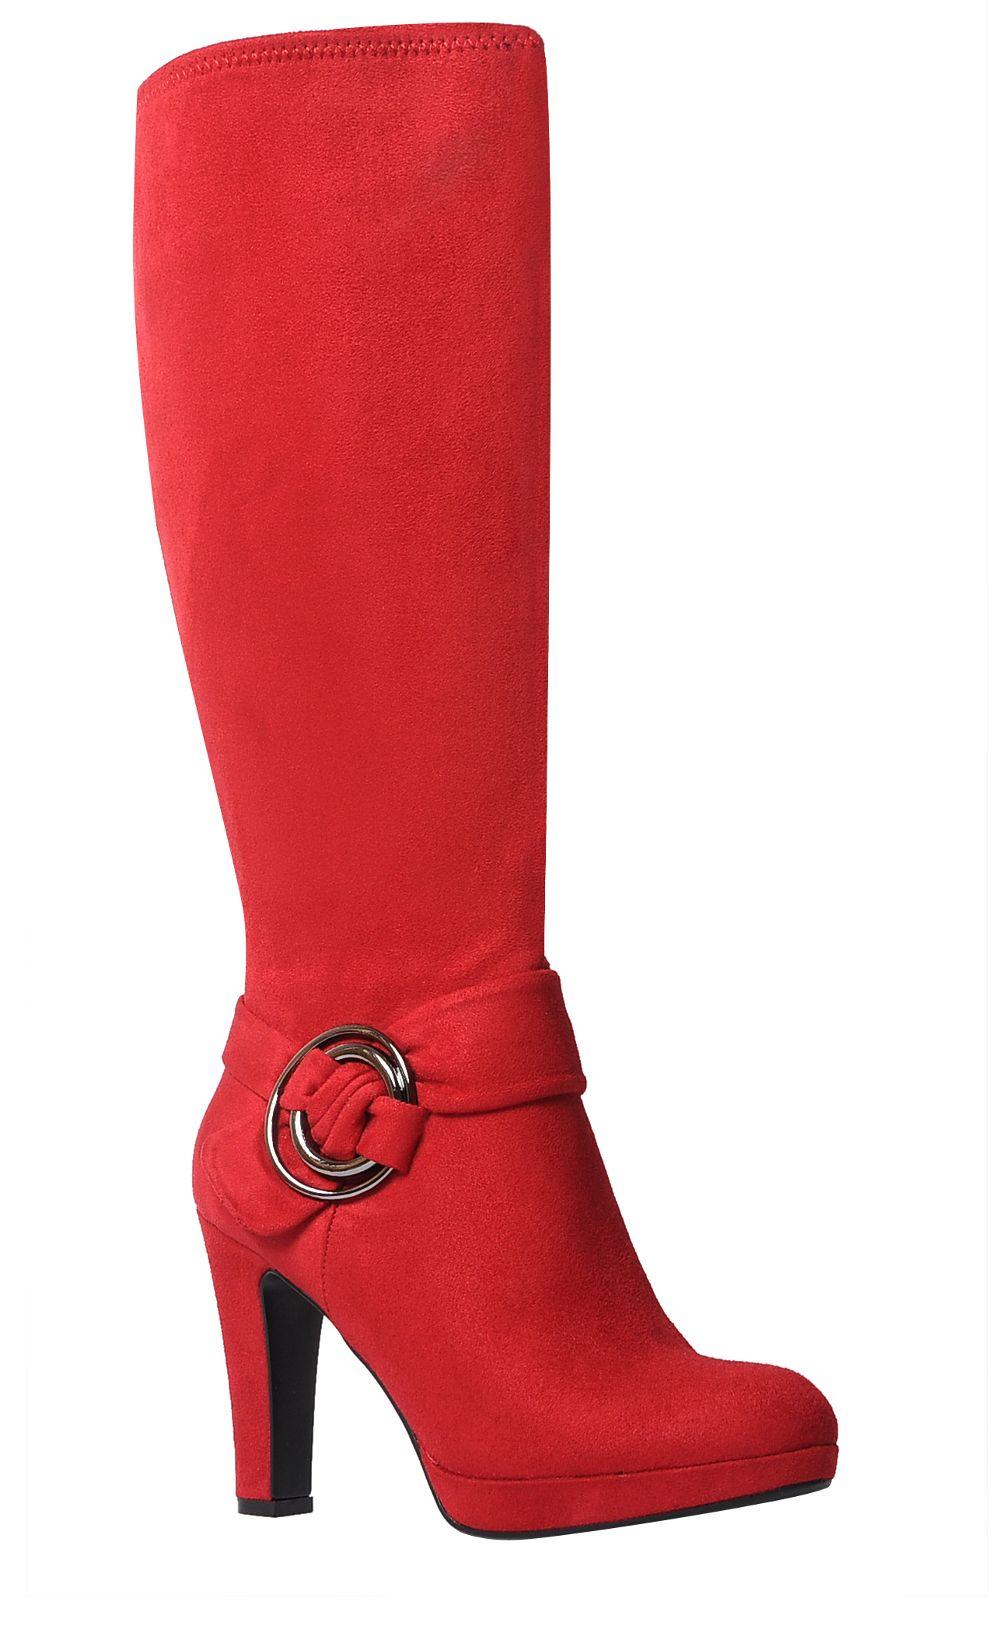 642bdd1135f7 Impo OWEN Stretch Dress Platform High Heel Boot